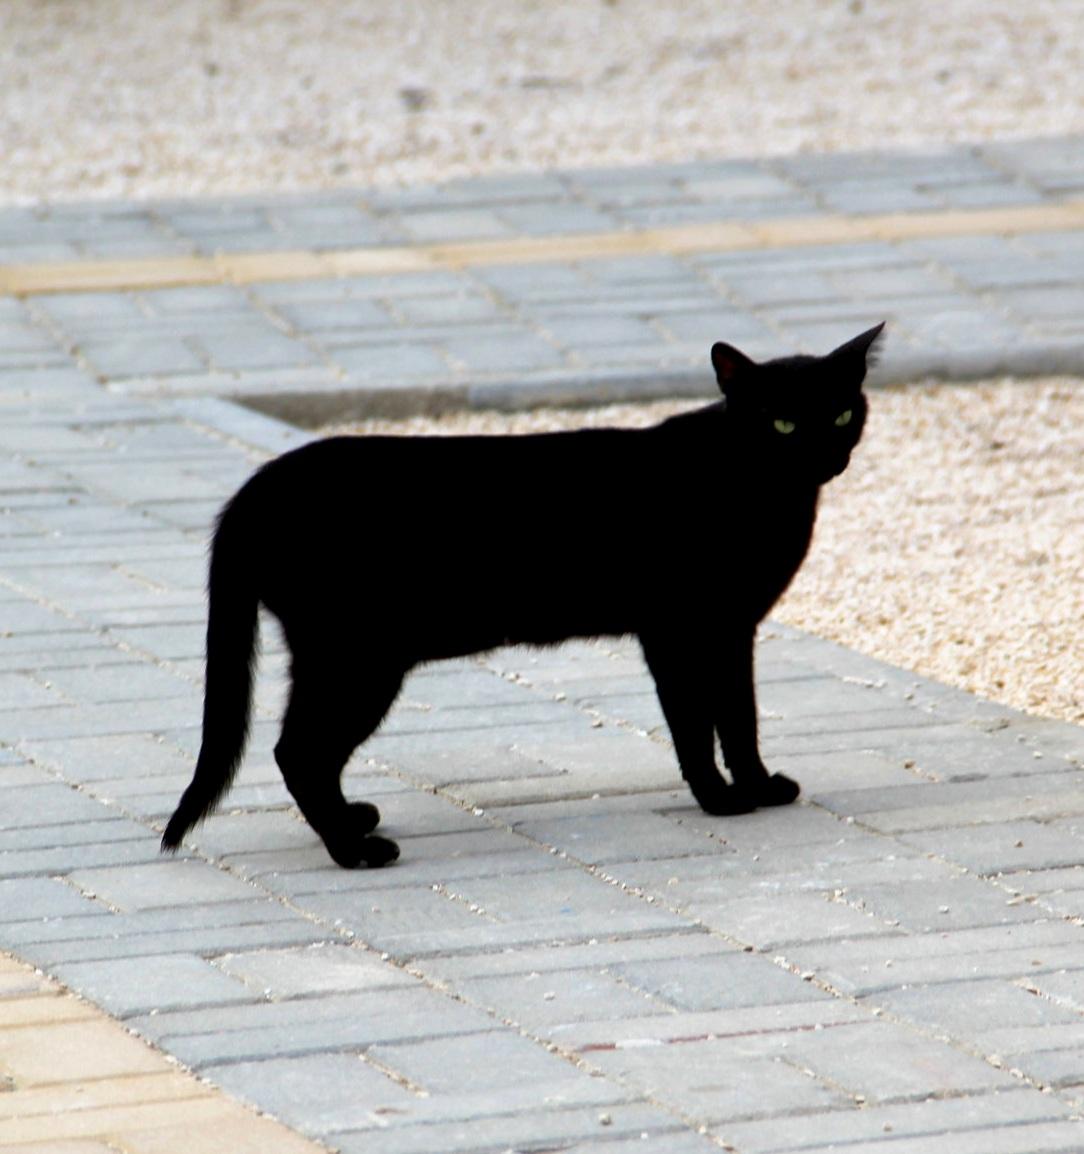 Bagheera the Cat. Film City, Zekreet, Qatar. Photo taken by: Tyanna LC